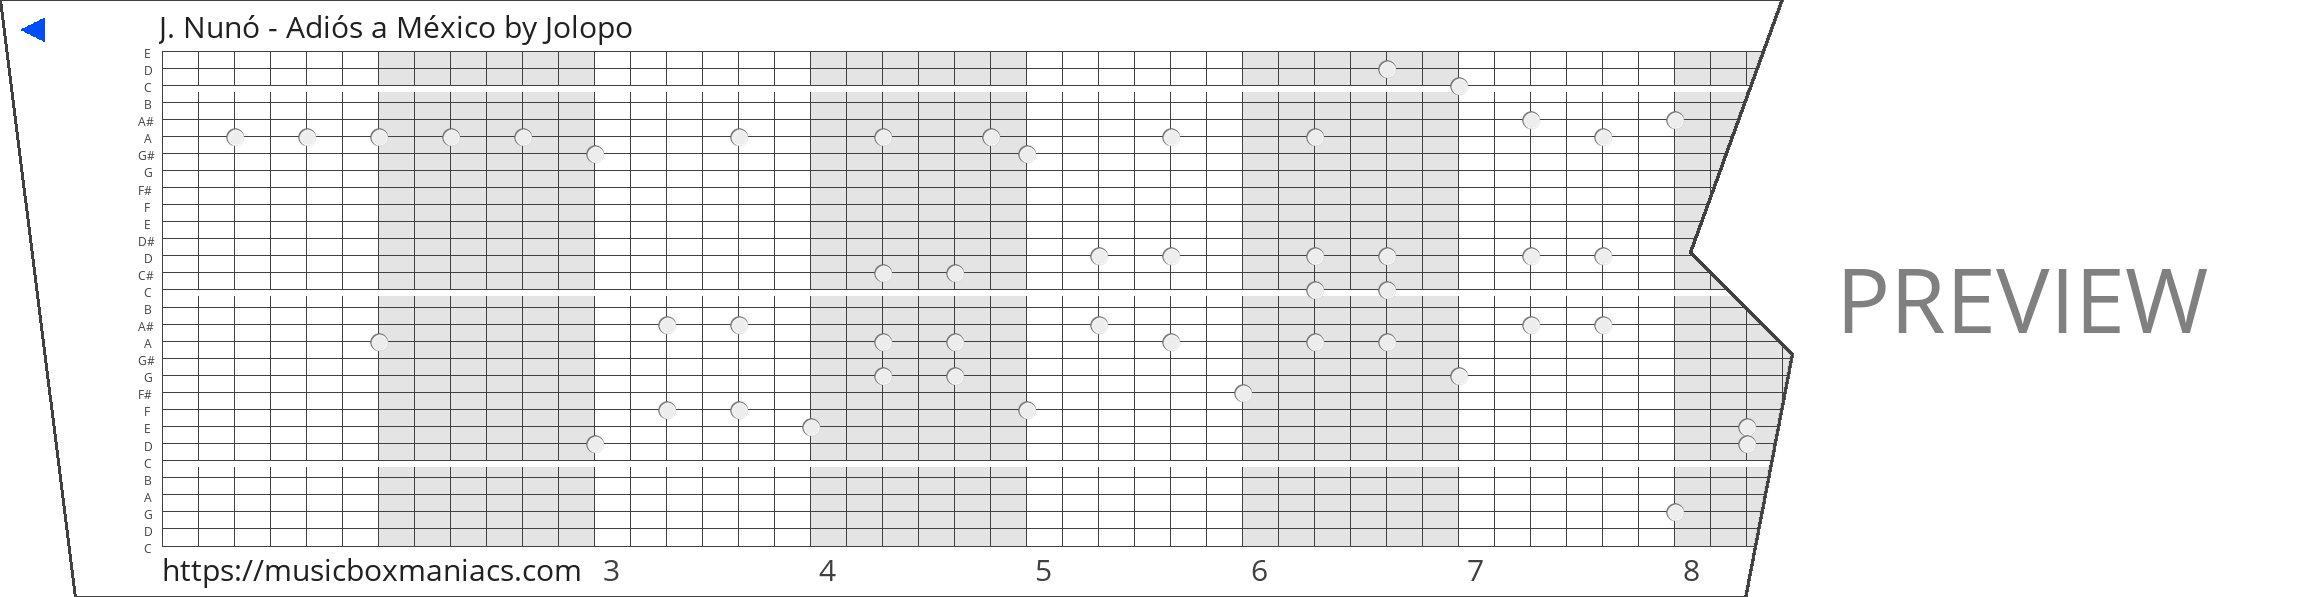 J. Nunó - Adiós a México 30 note music box paper strip